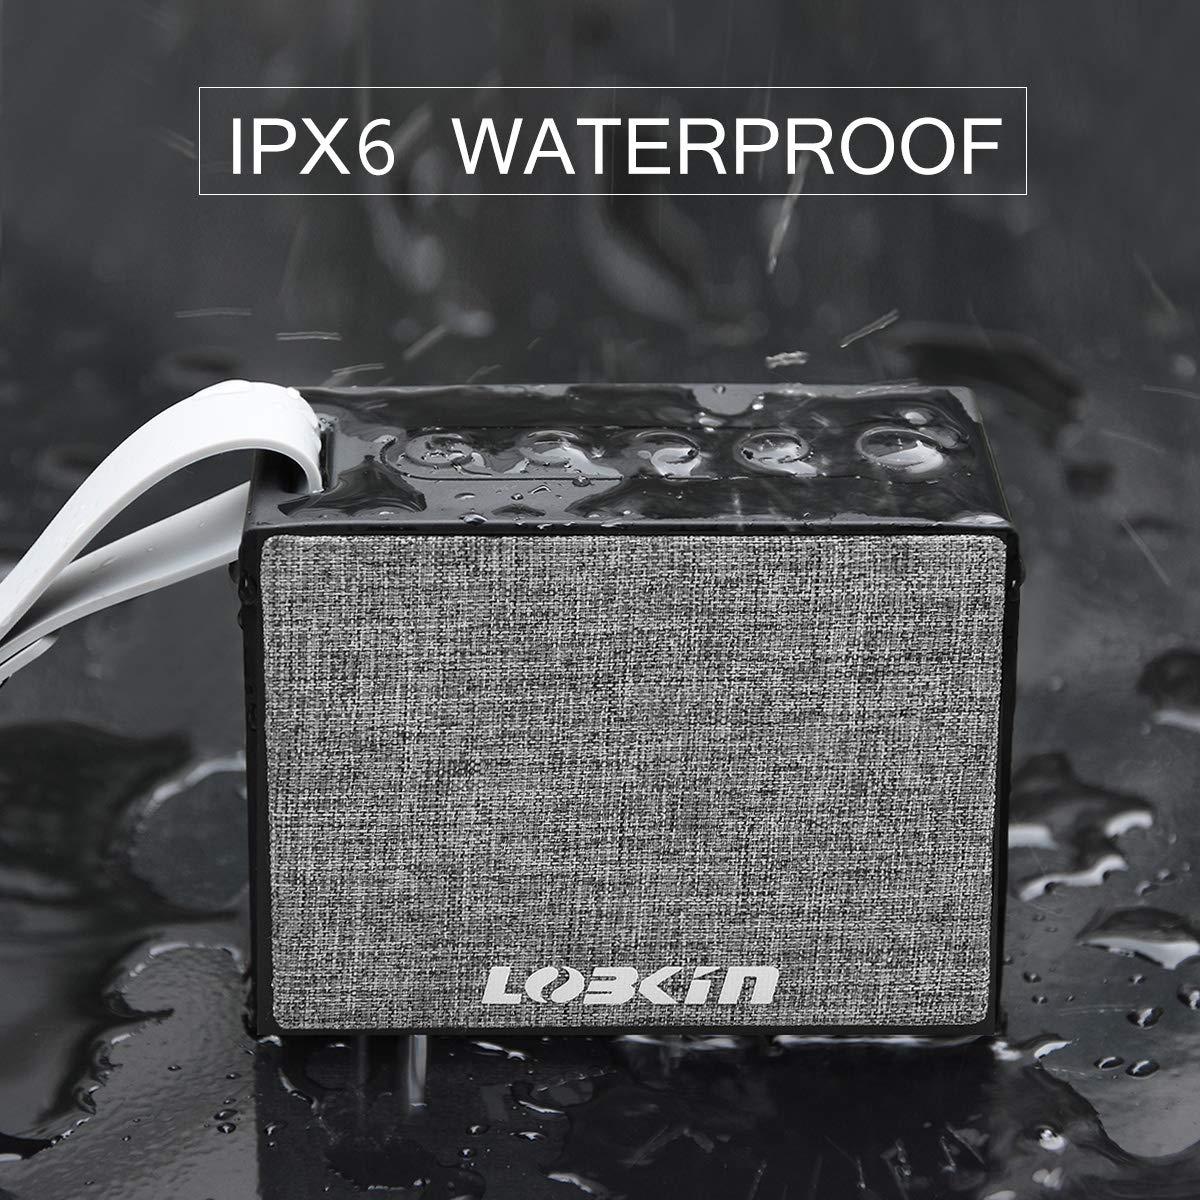 Bluetooth Speakers, Lobkin X9S Ultra Portable Wireless Bluetooth Speaker, Wireless Smart Speaker with Amazon Alexa (BLACK)